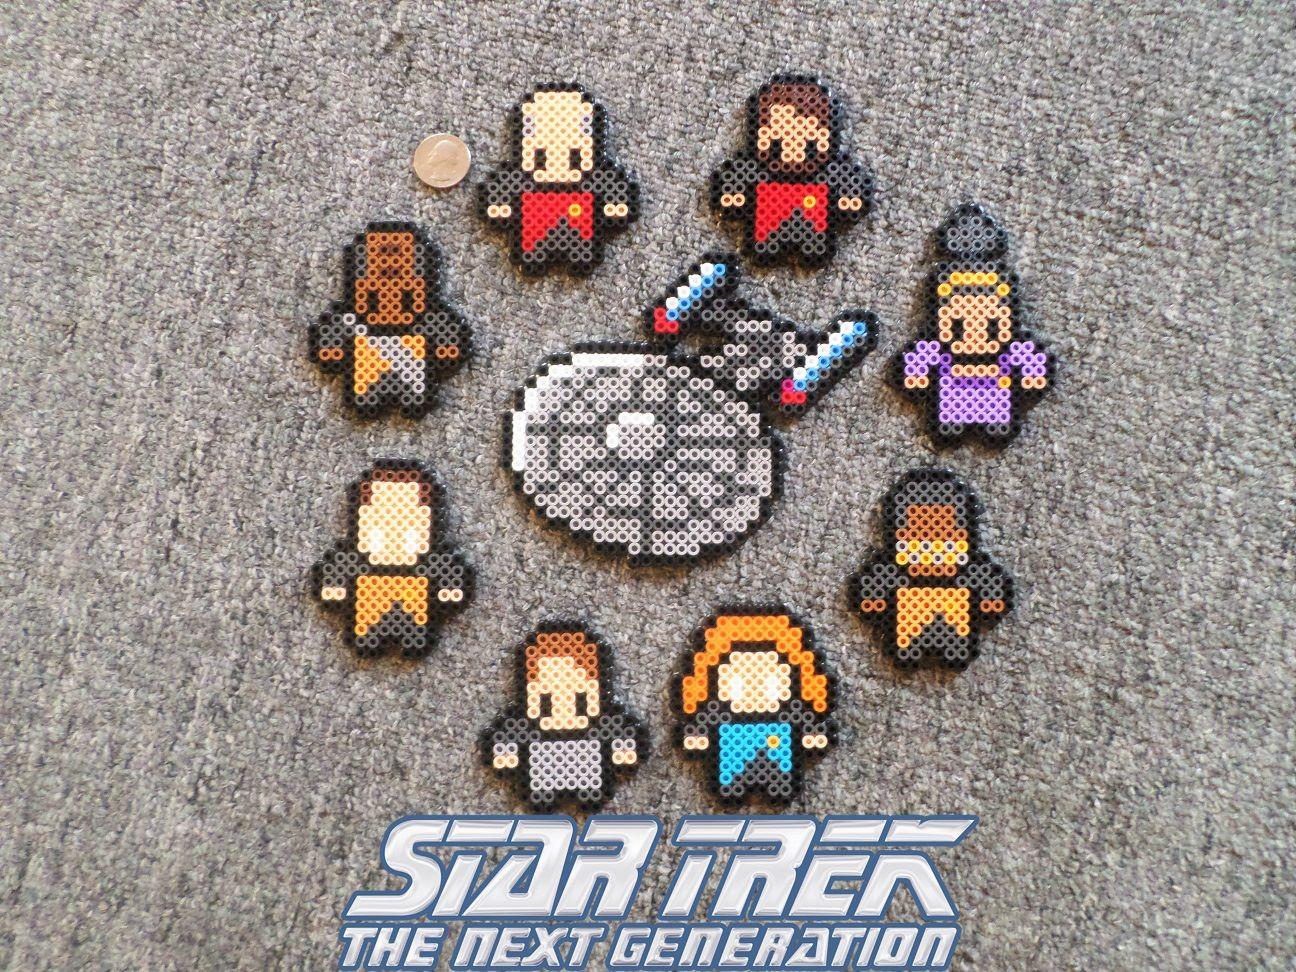 Star Trek: Next Gen characters - Perler bead designs | Star Trek DIY ...